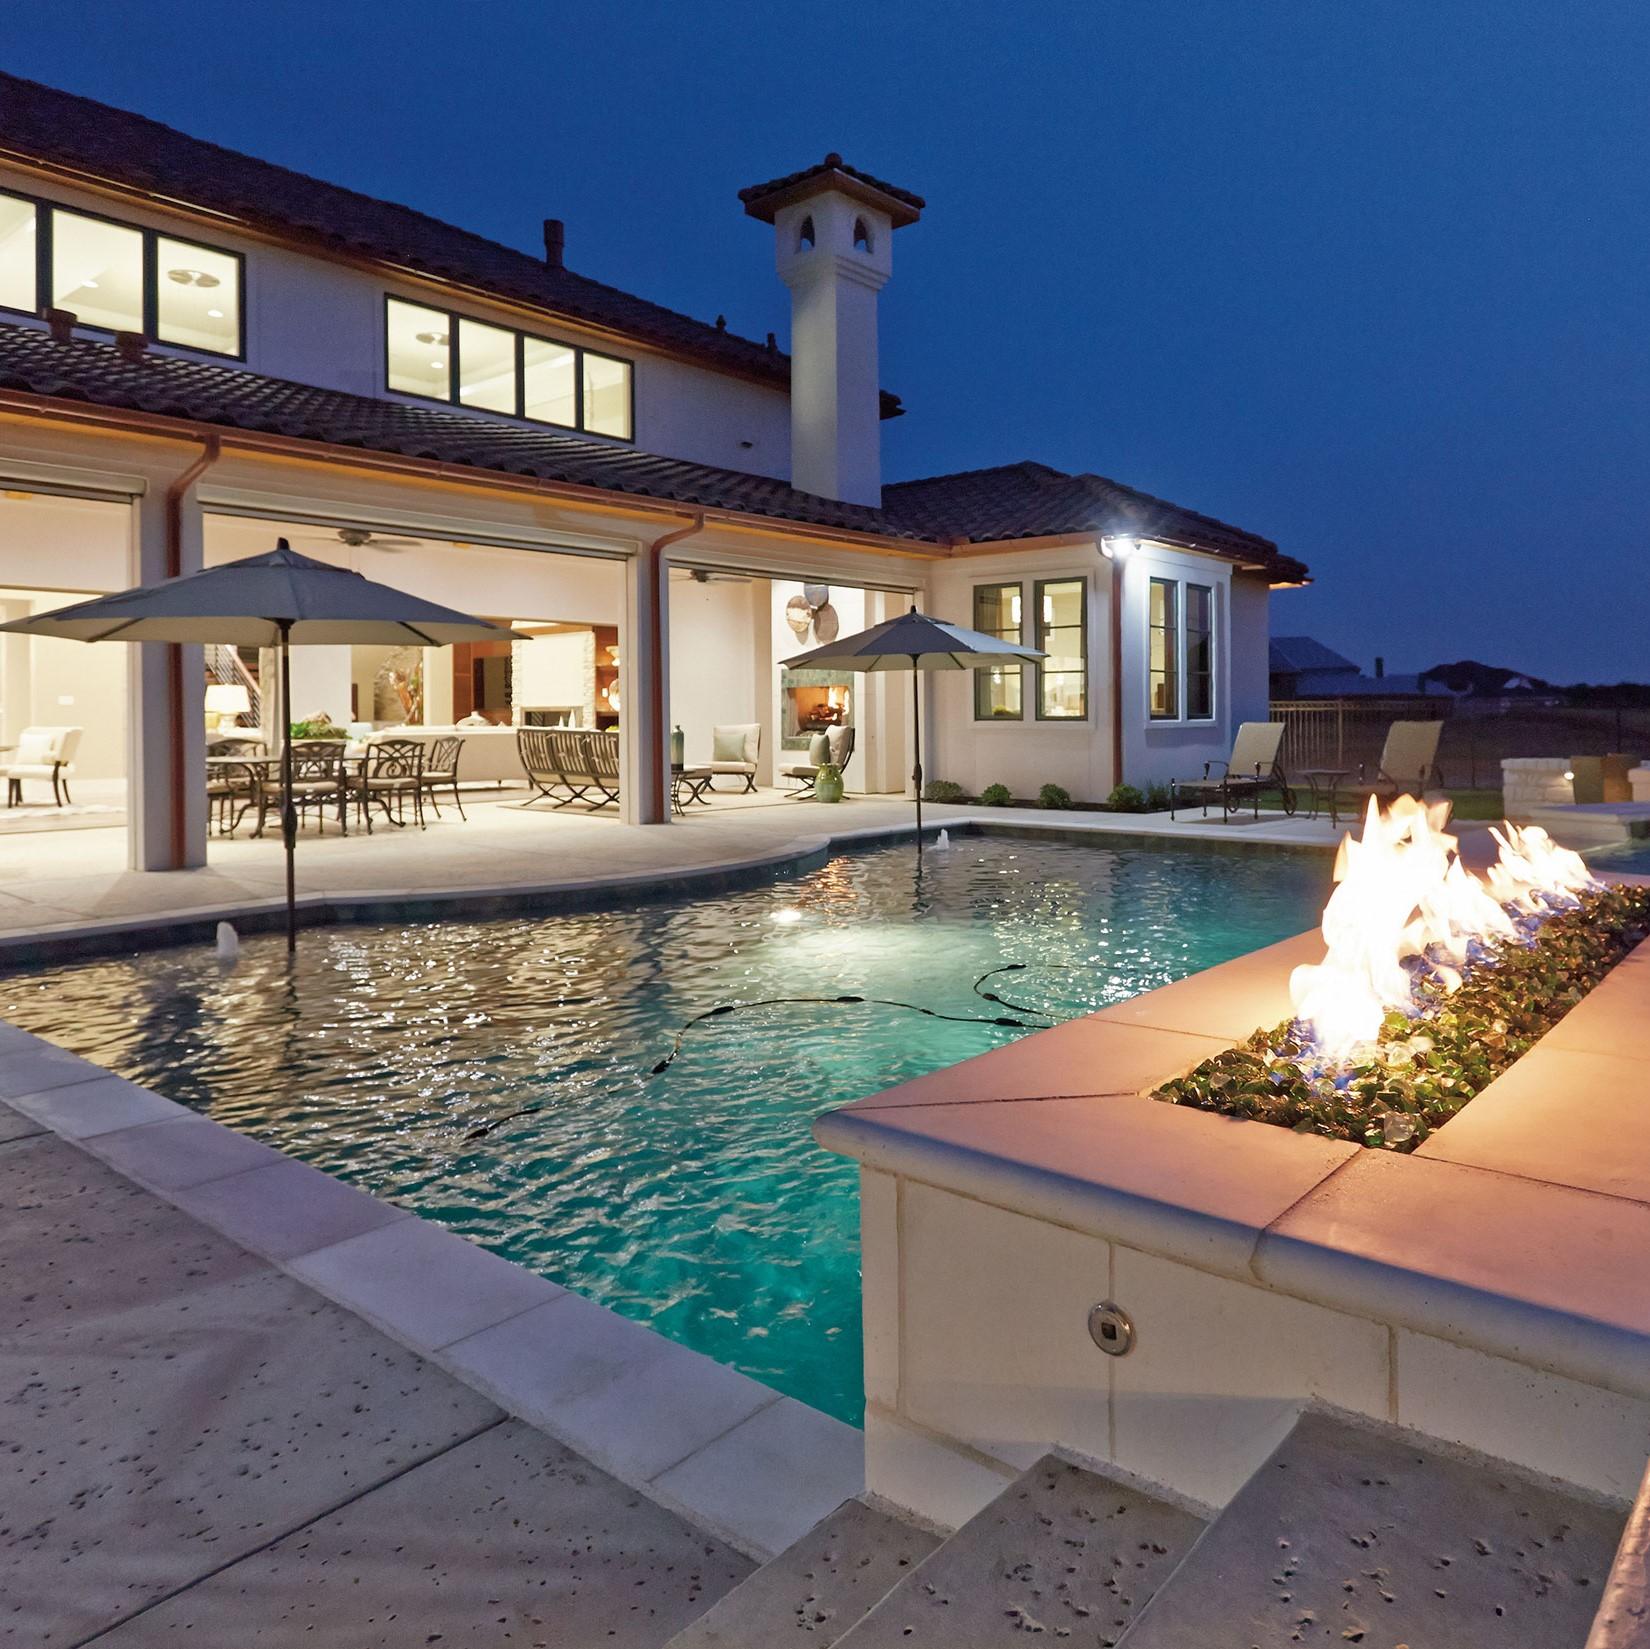 custom pool build with fireplace